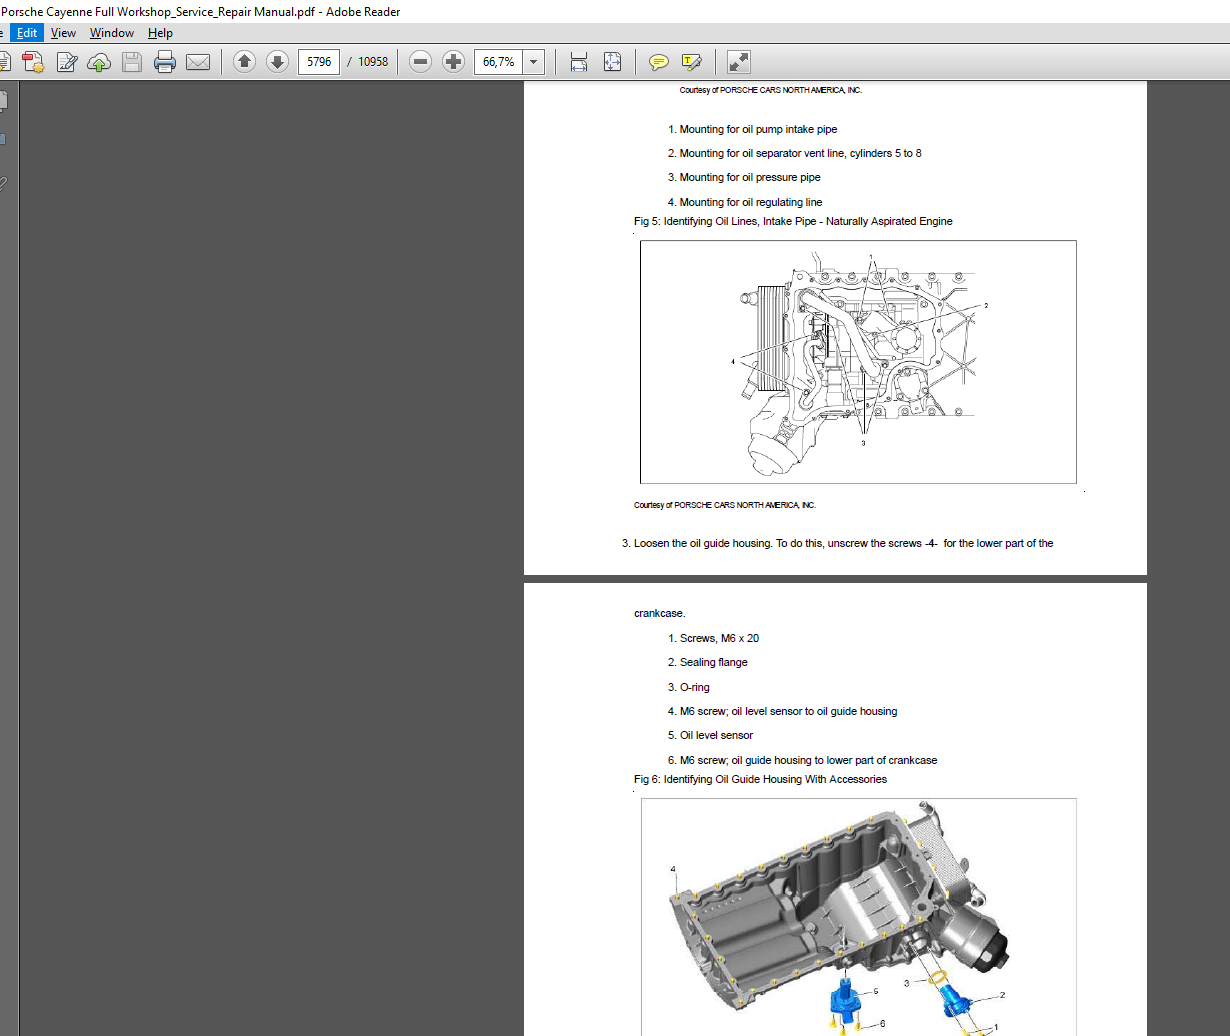 Porsche Cayenne Full Workshop Service Repair Manual